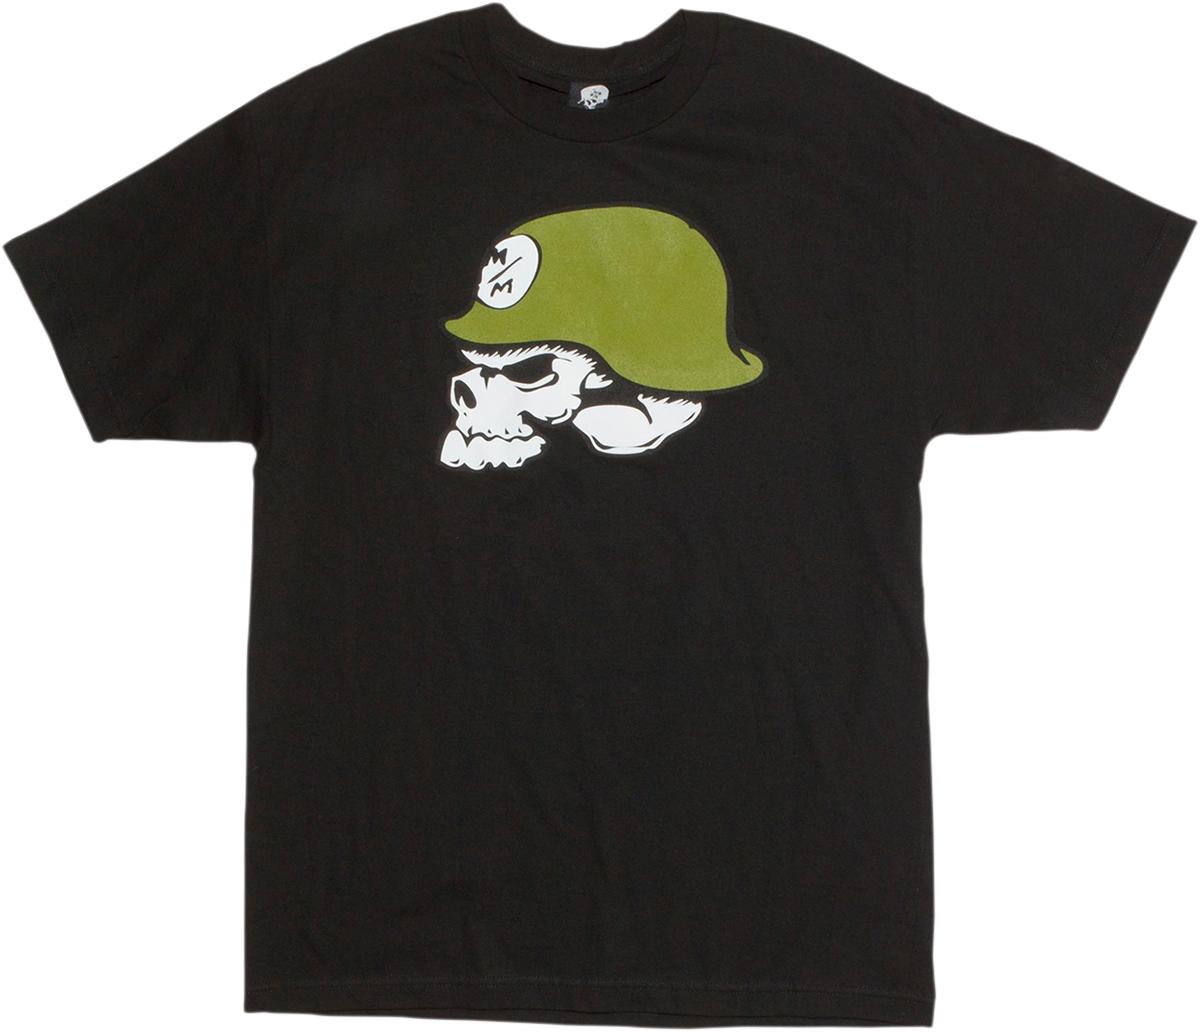 OG Boy's T-Shirt